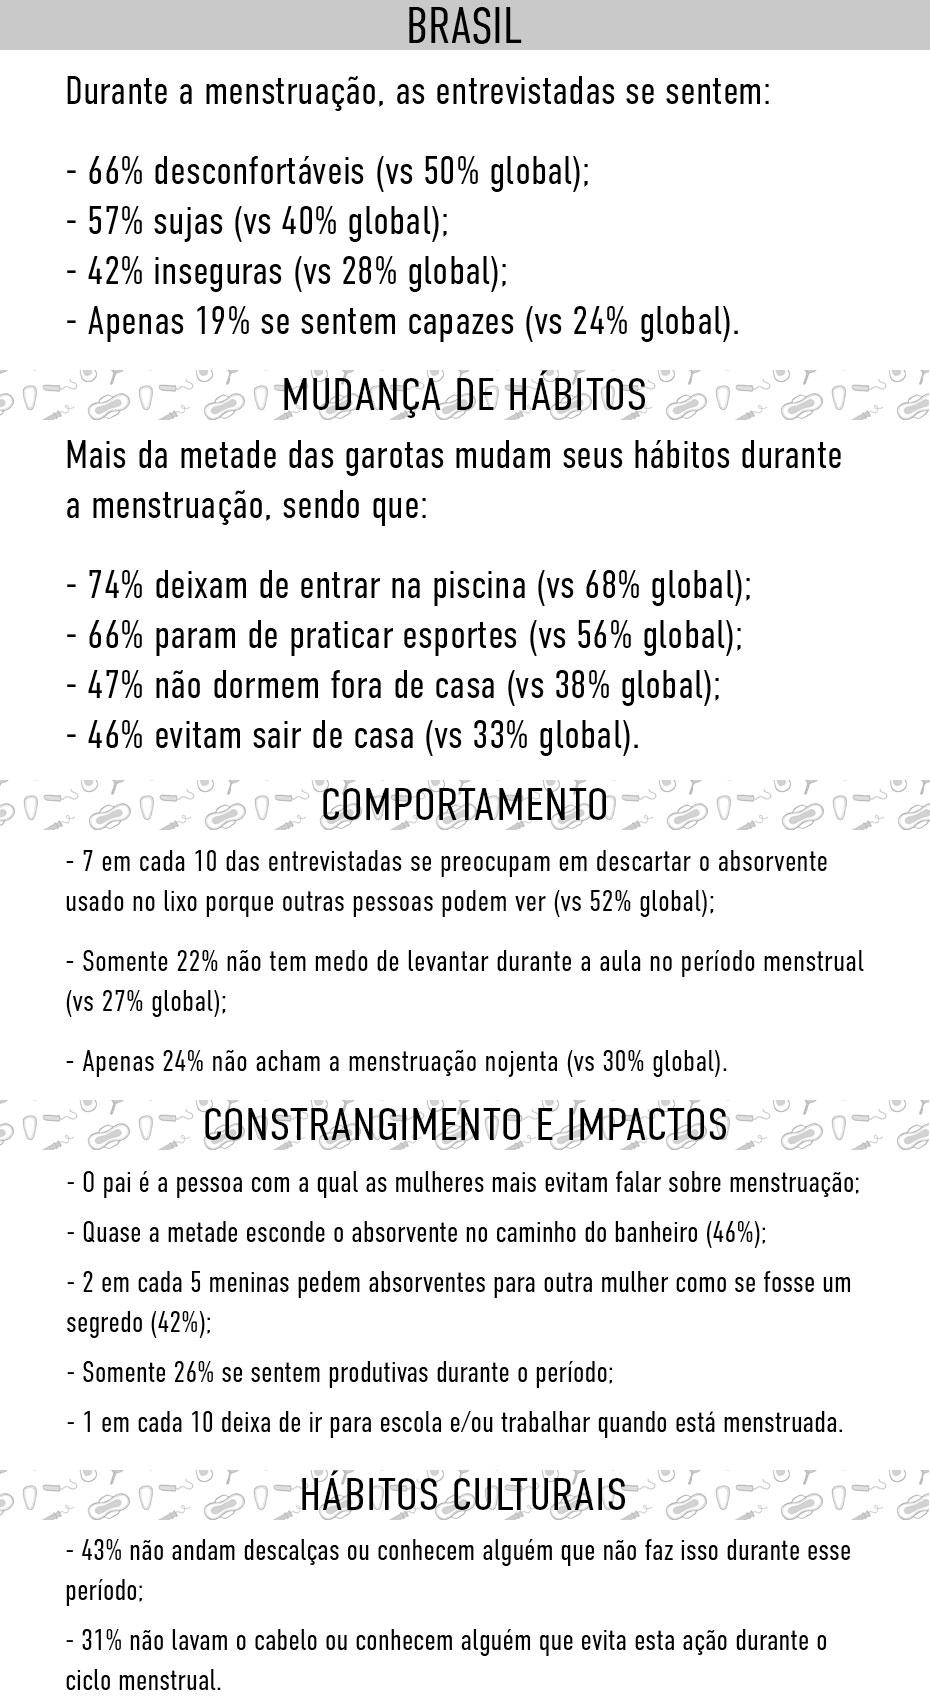 pesquisa-sempre-livre-dia-mundial-menstruacao-brasil-inovasocial-03